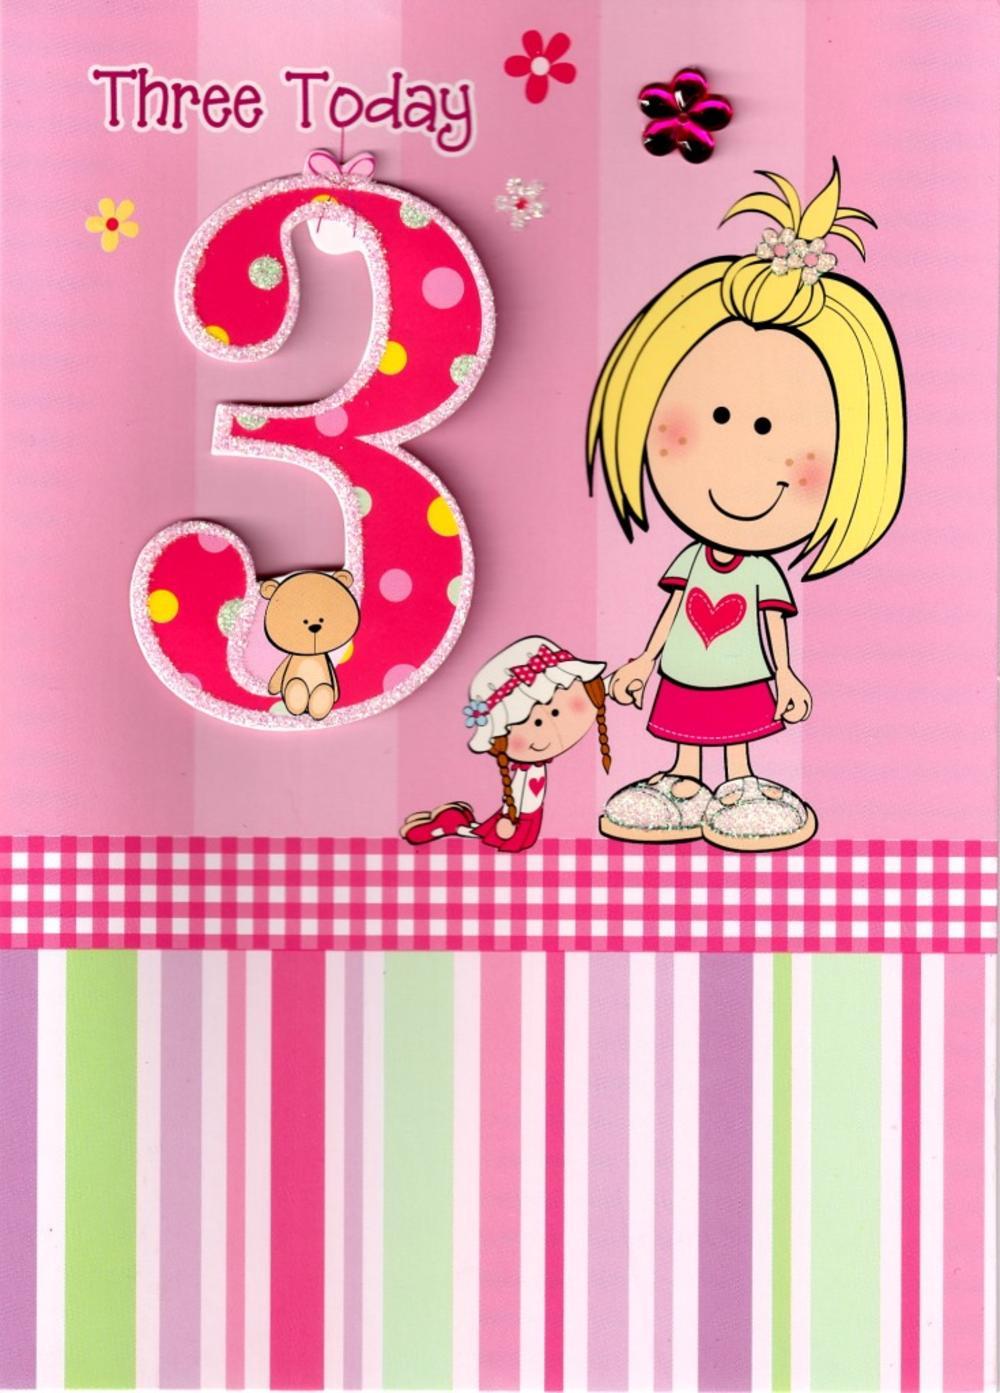 Girls 3rd Birthday 3 Three Today Card